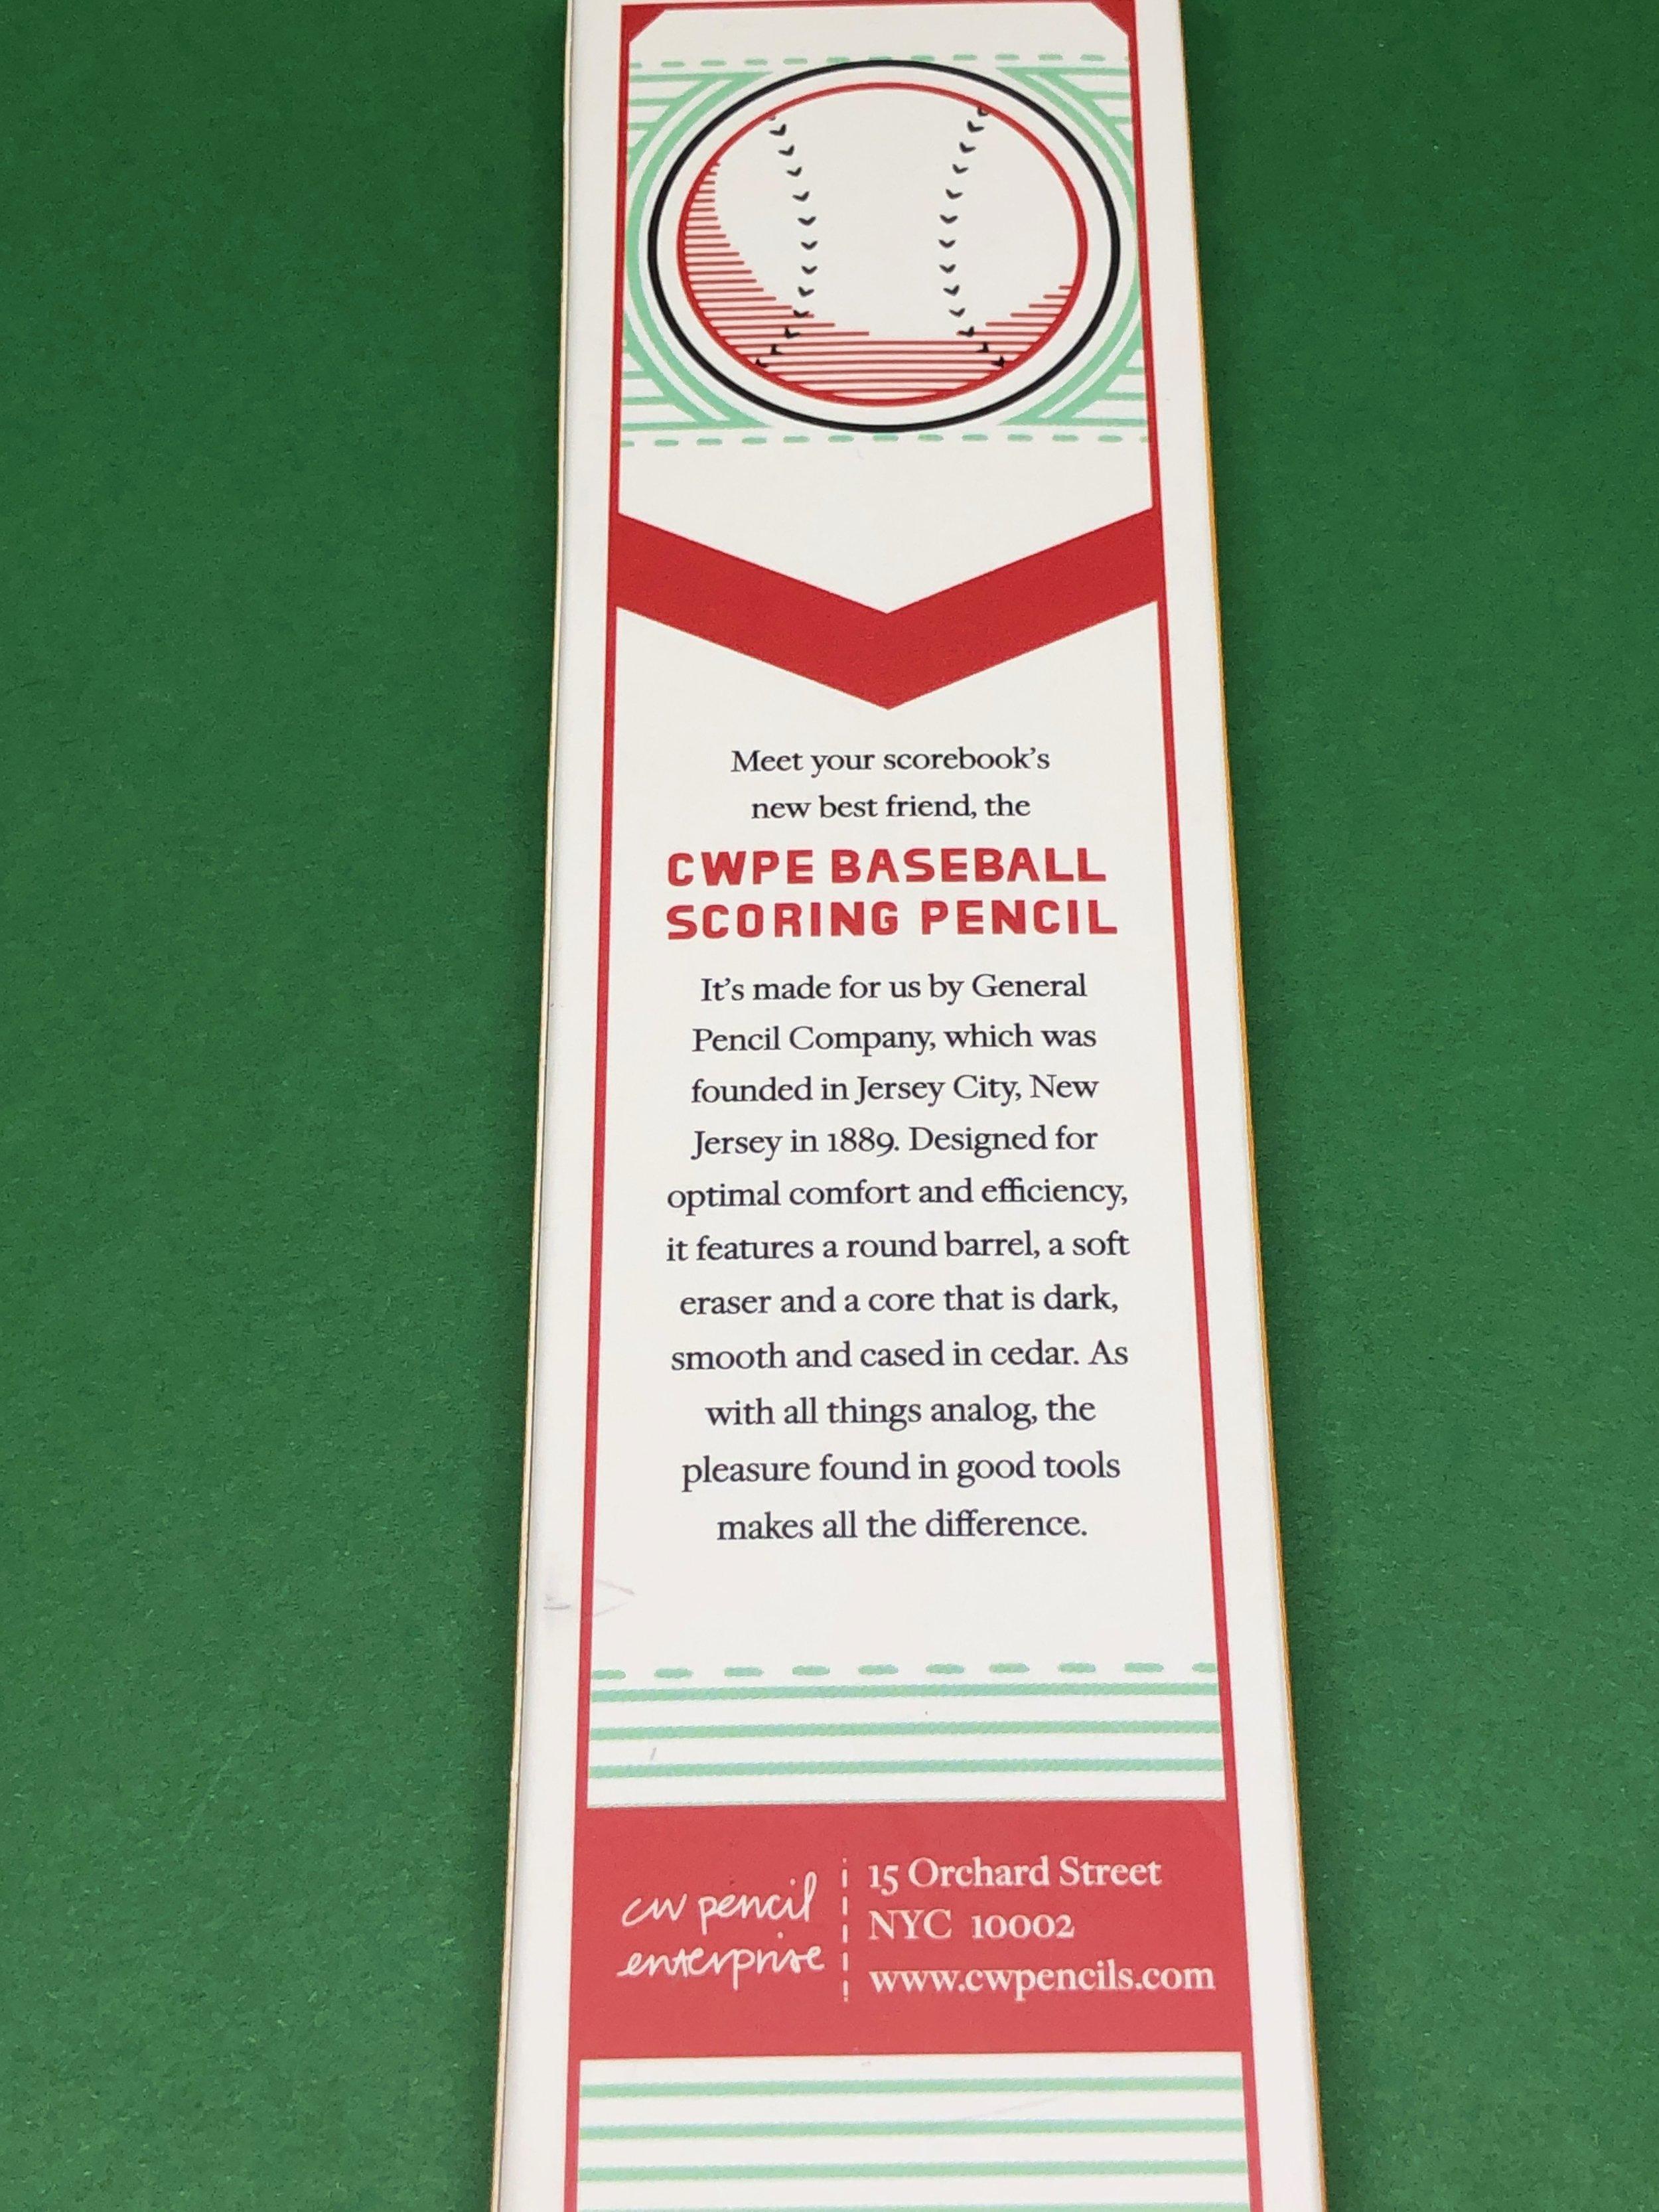 cwpe-generals-baseball-scoring-pencil-7.jpg